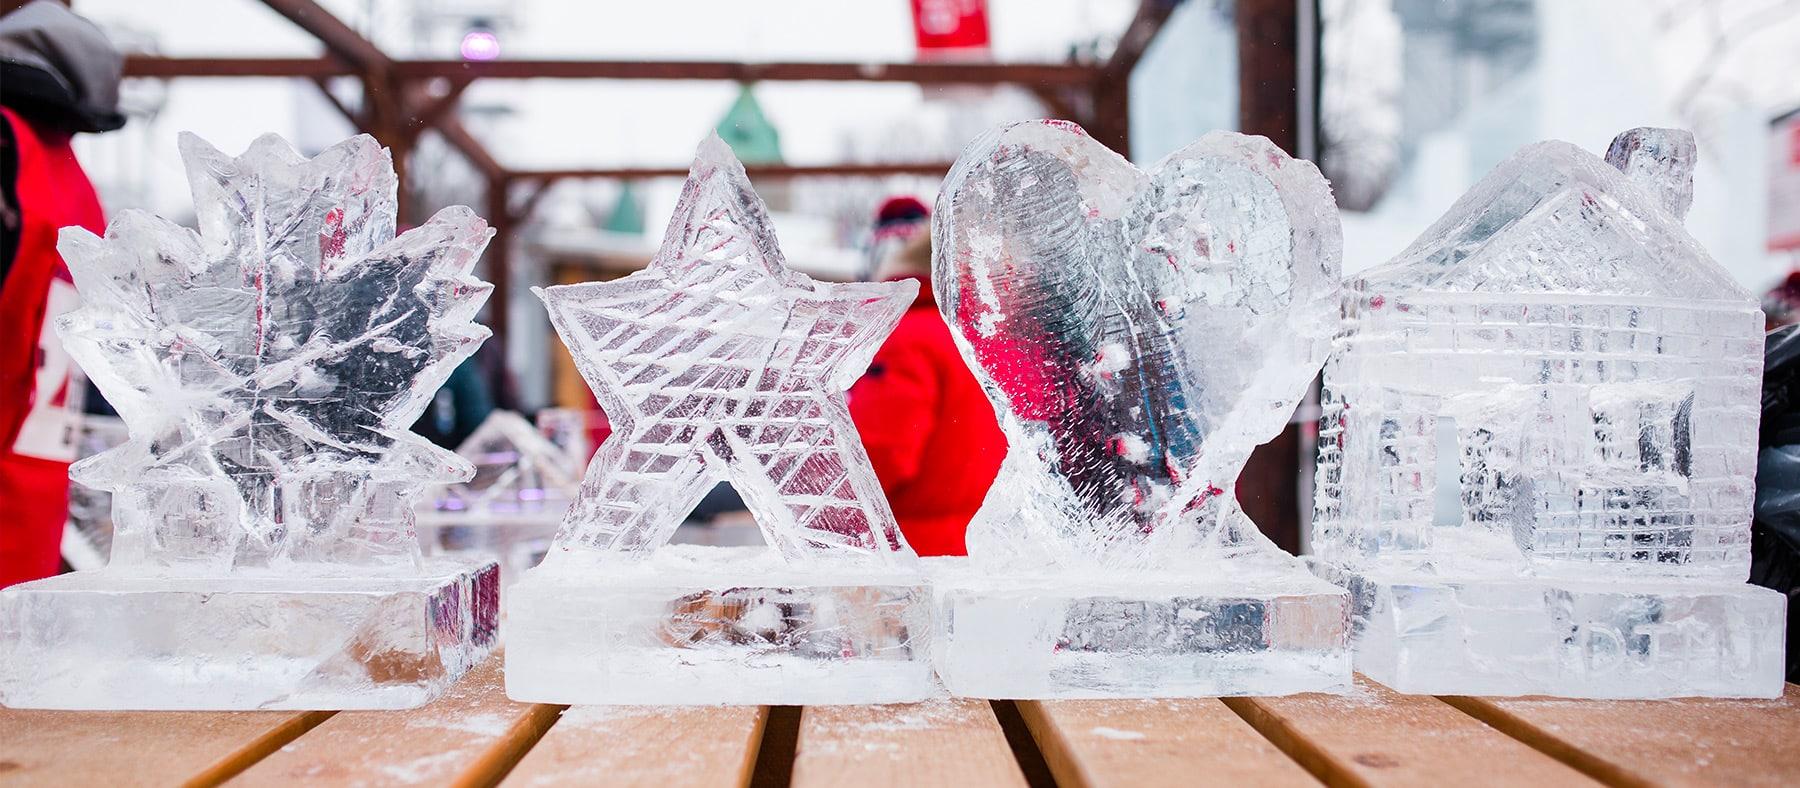 carnaval-de-quebec-sculpture-glace-quebec-le-mag